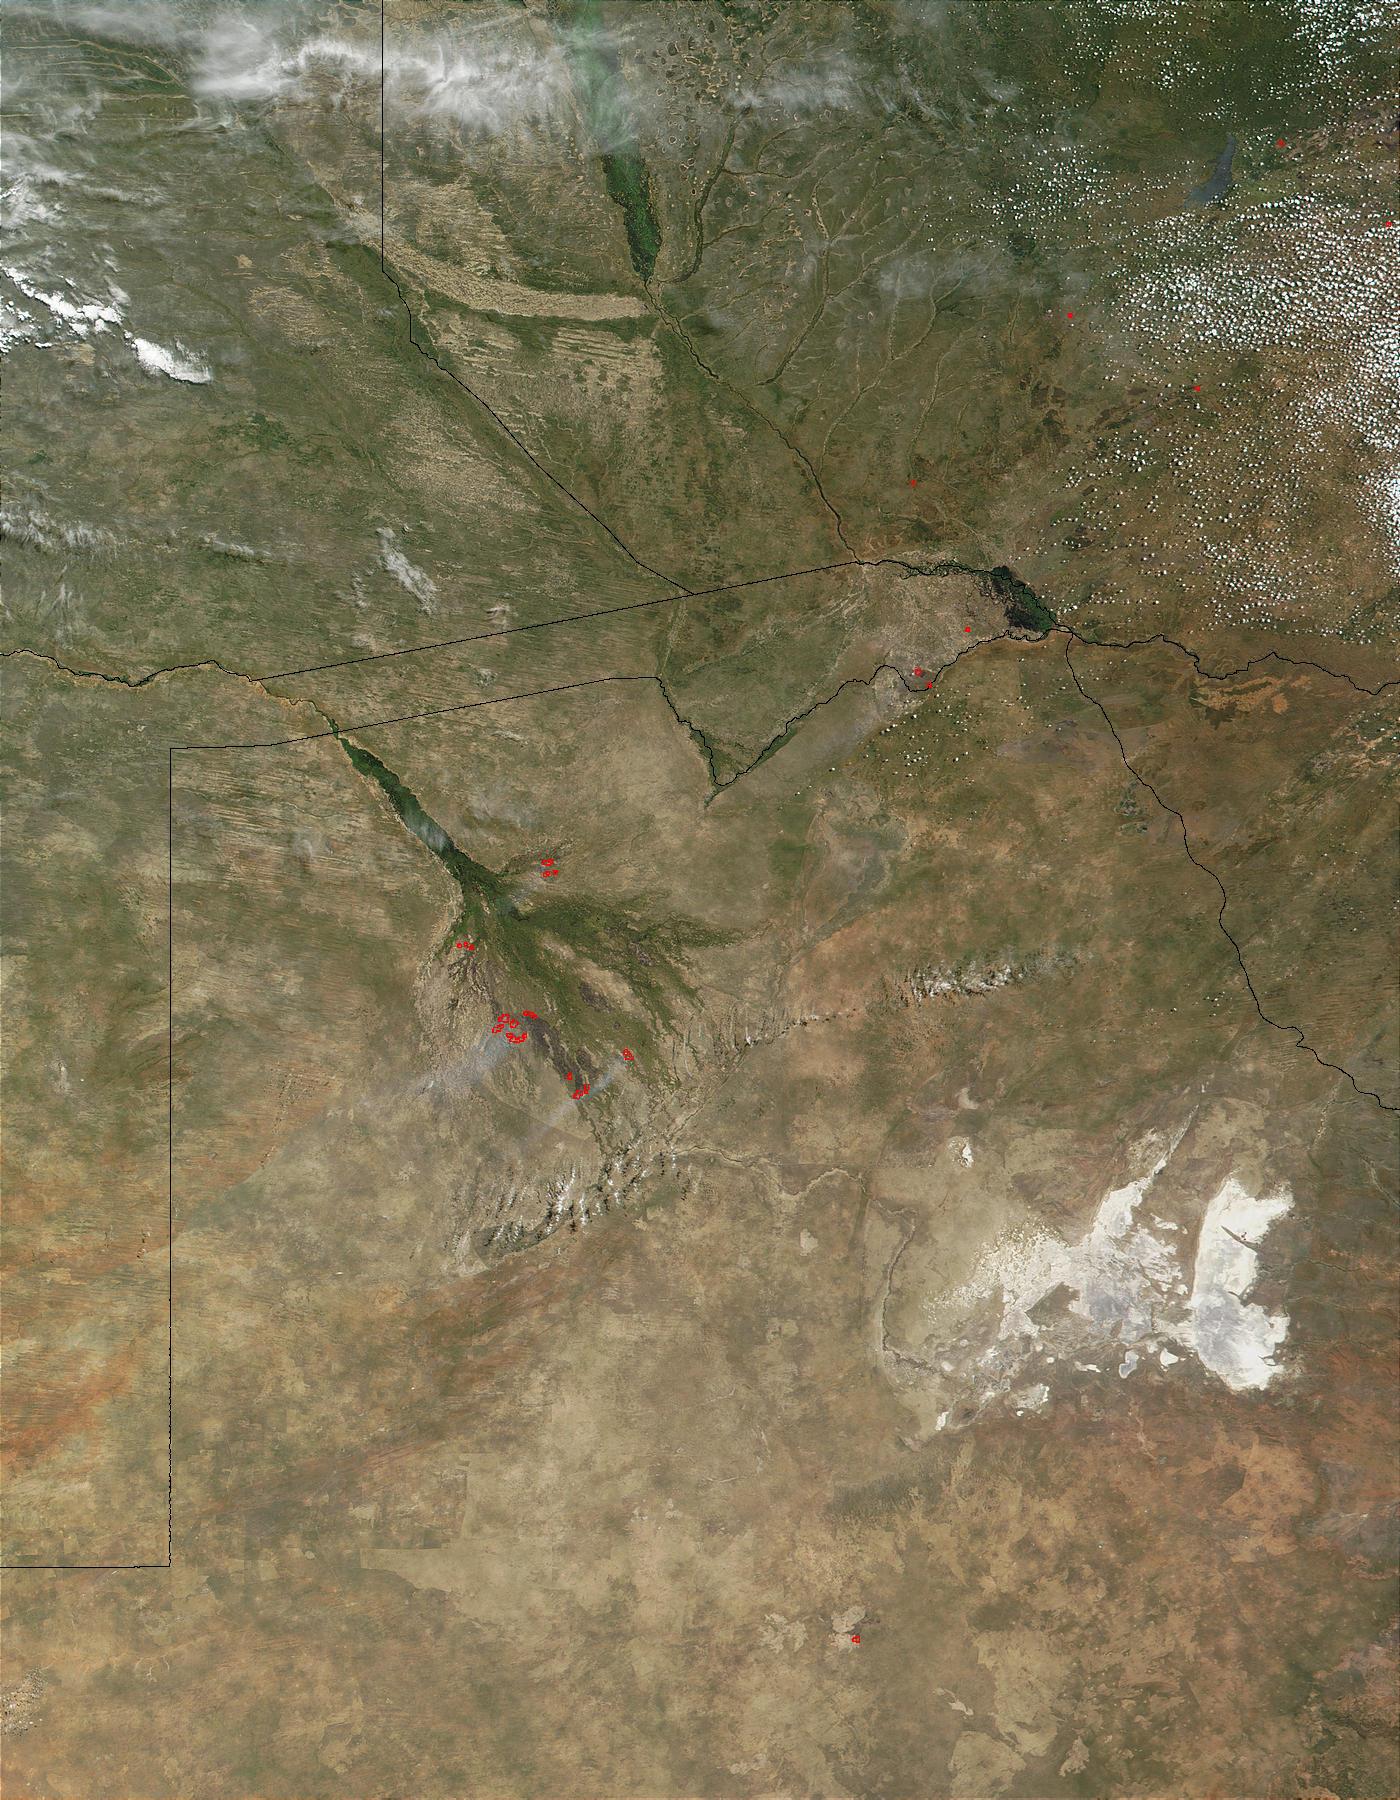 Fires in the Okavango Delta, Botswana - related image preview